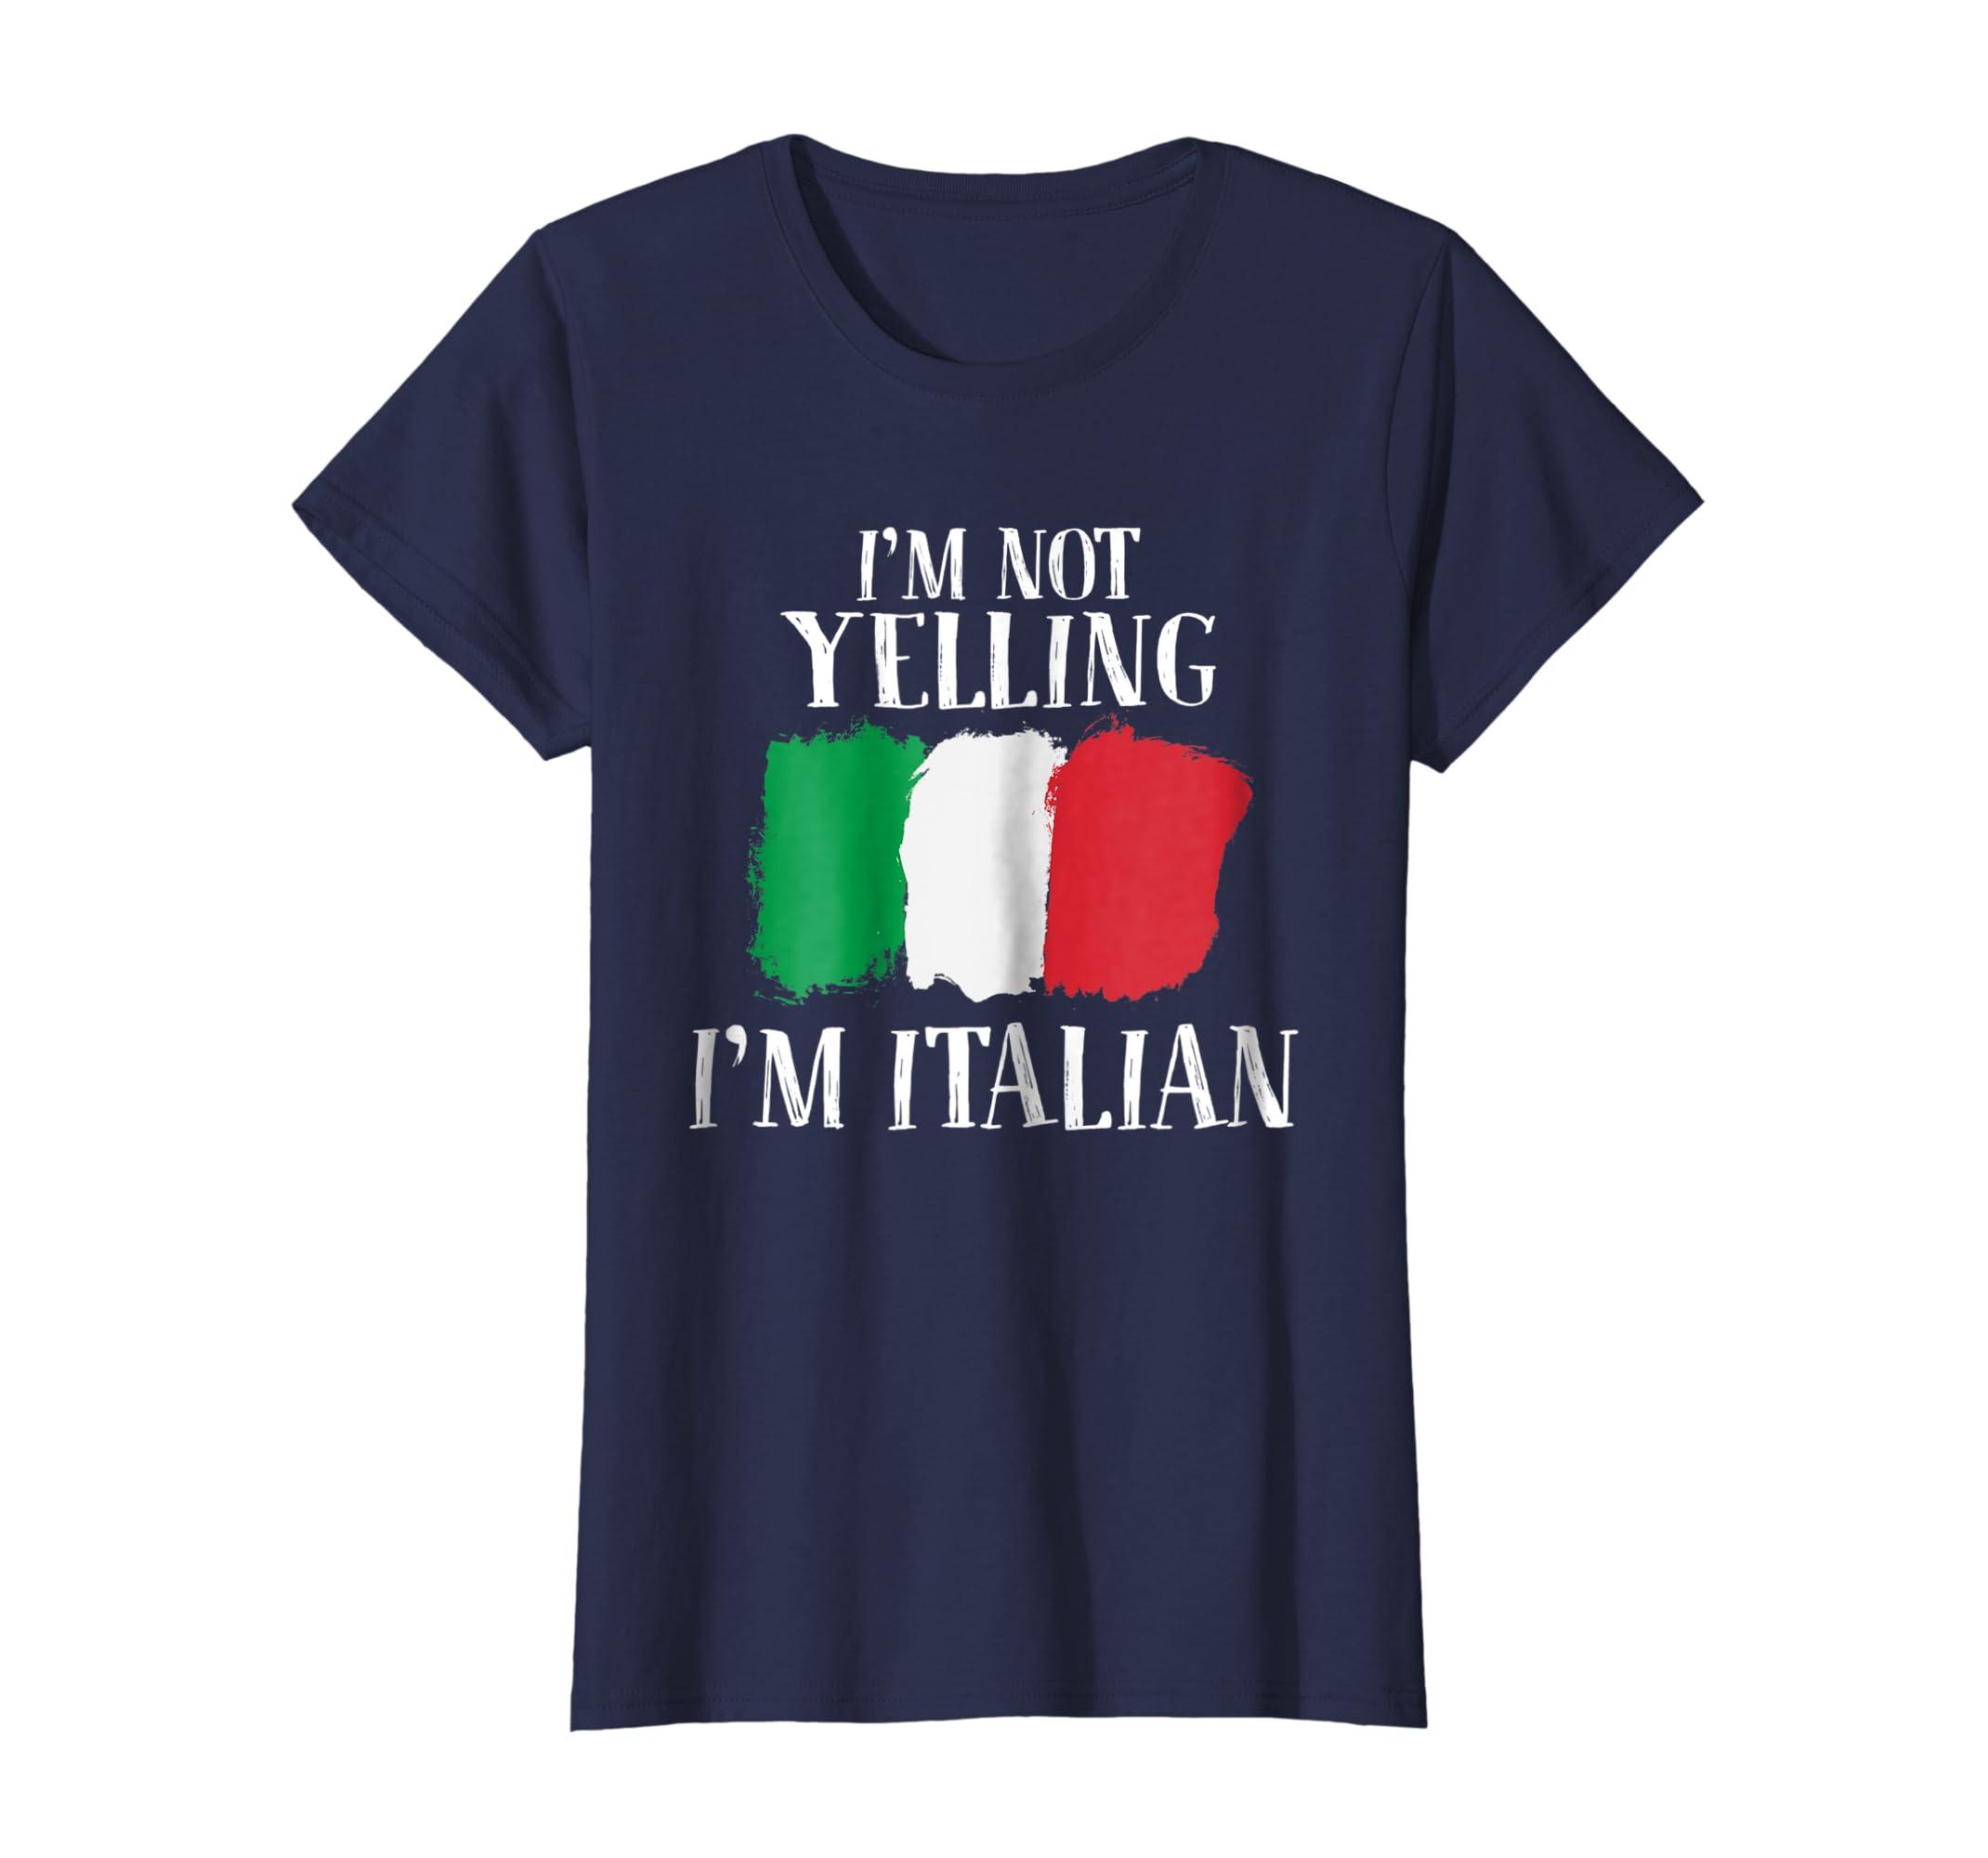 985b0a7c0 Amazon.com: I'm Not Yelling I'm Italian Shirt Funny Italy T-Shirt: Clothing